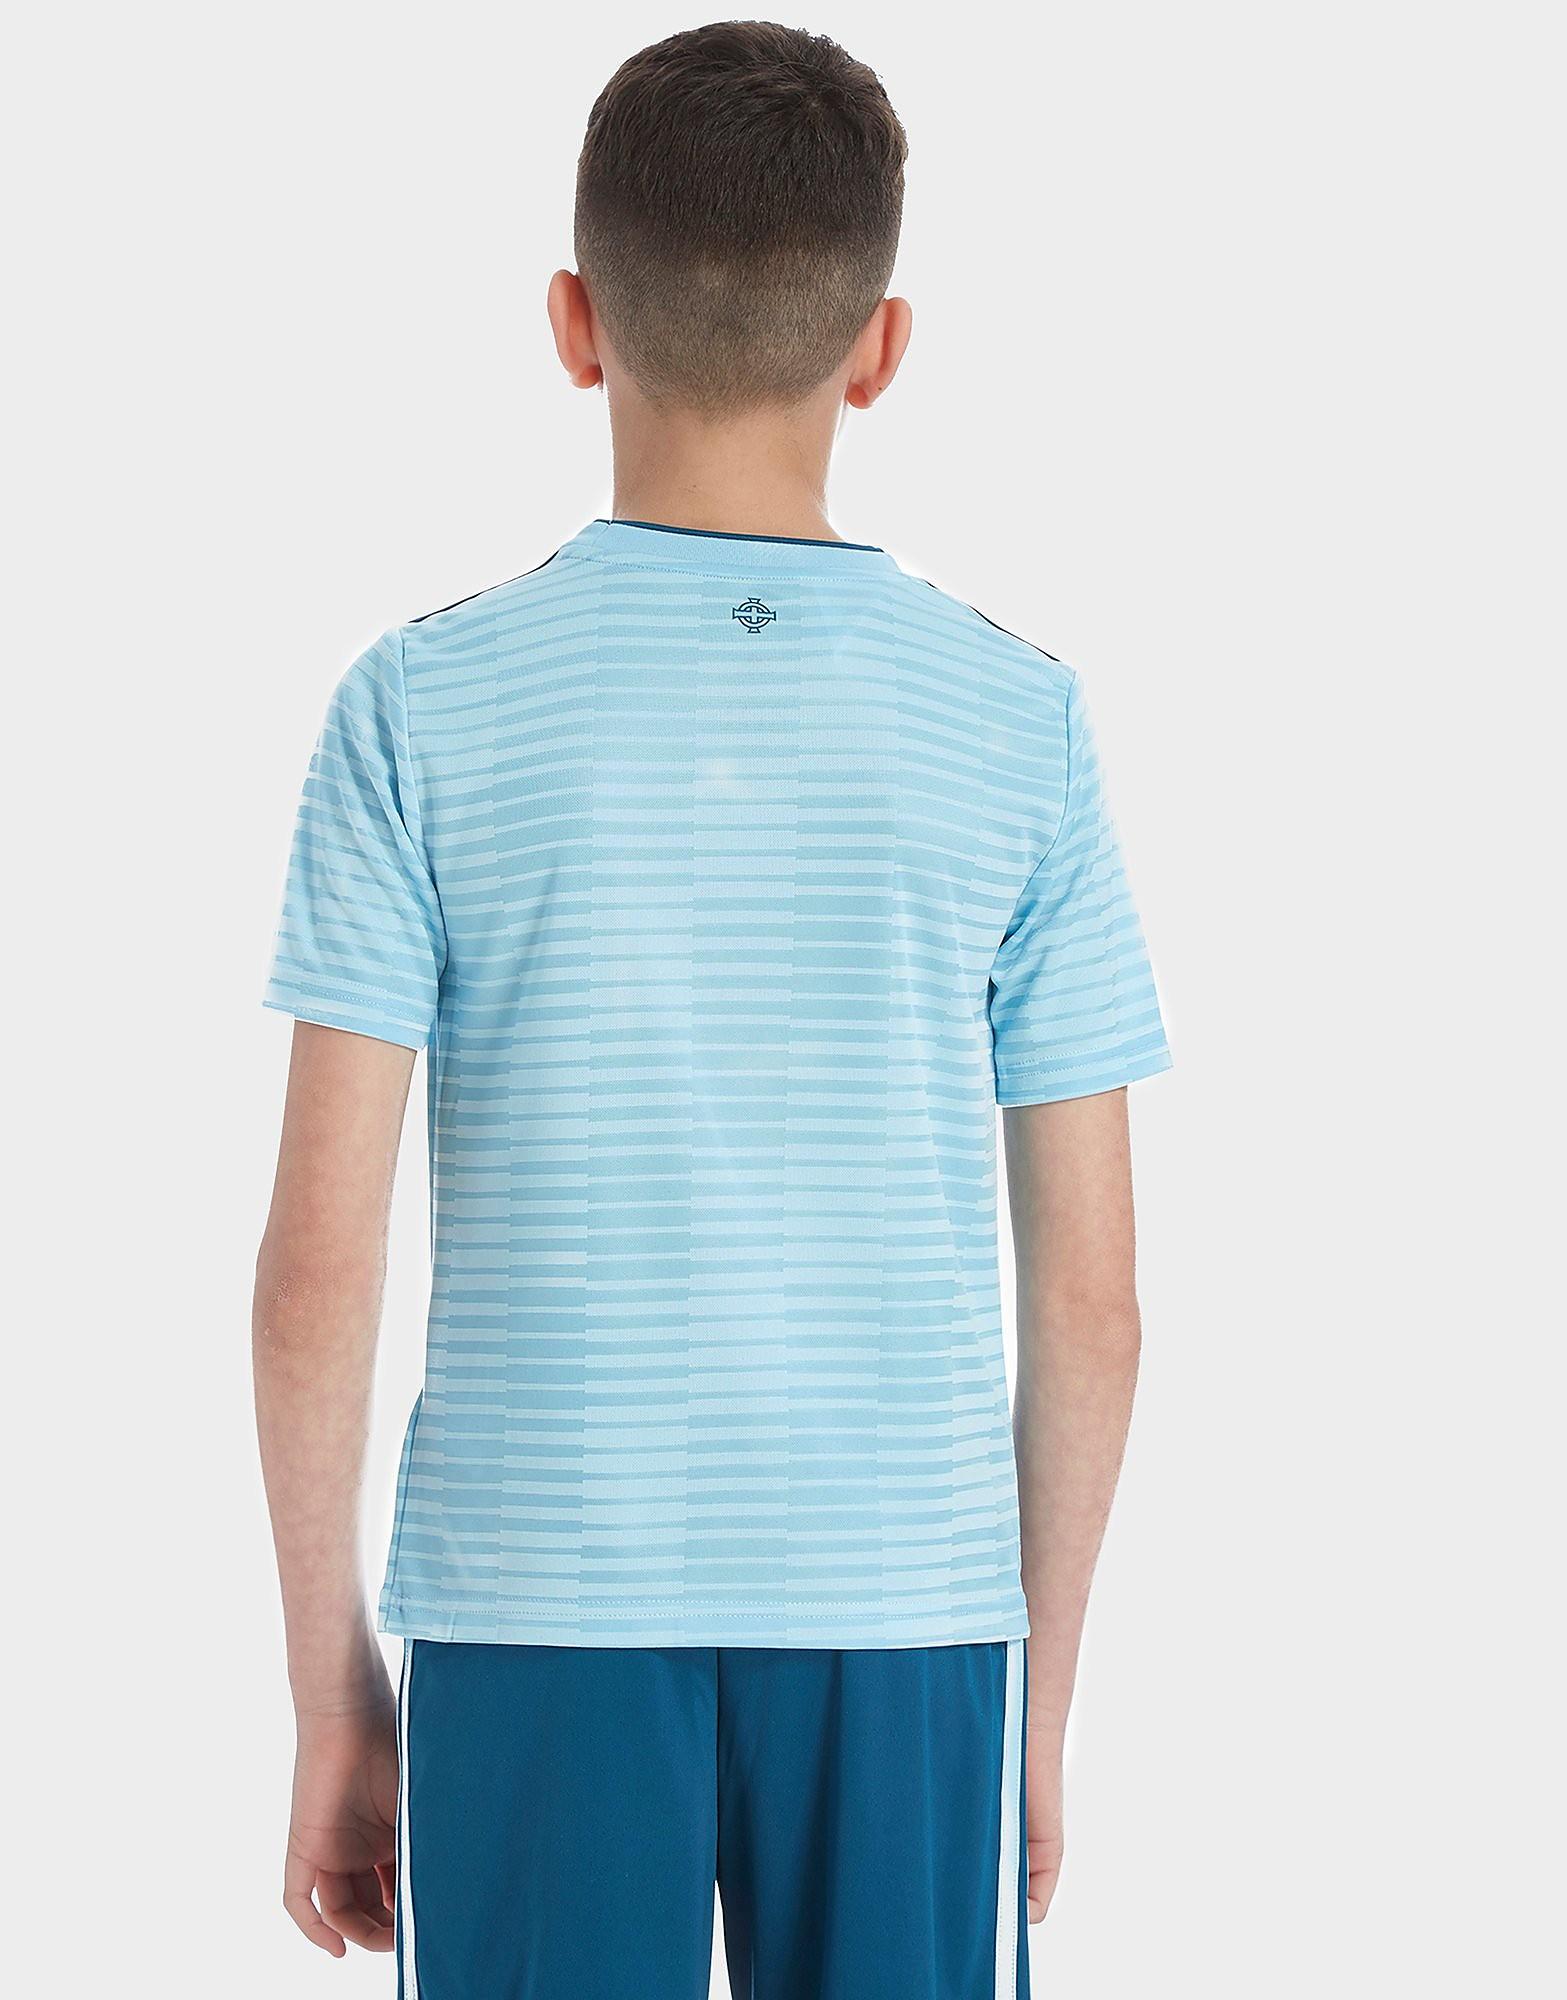 adidas Northern Ireland 2018 Away Shirt Junior